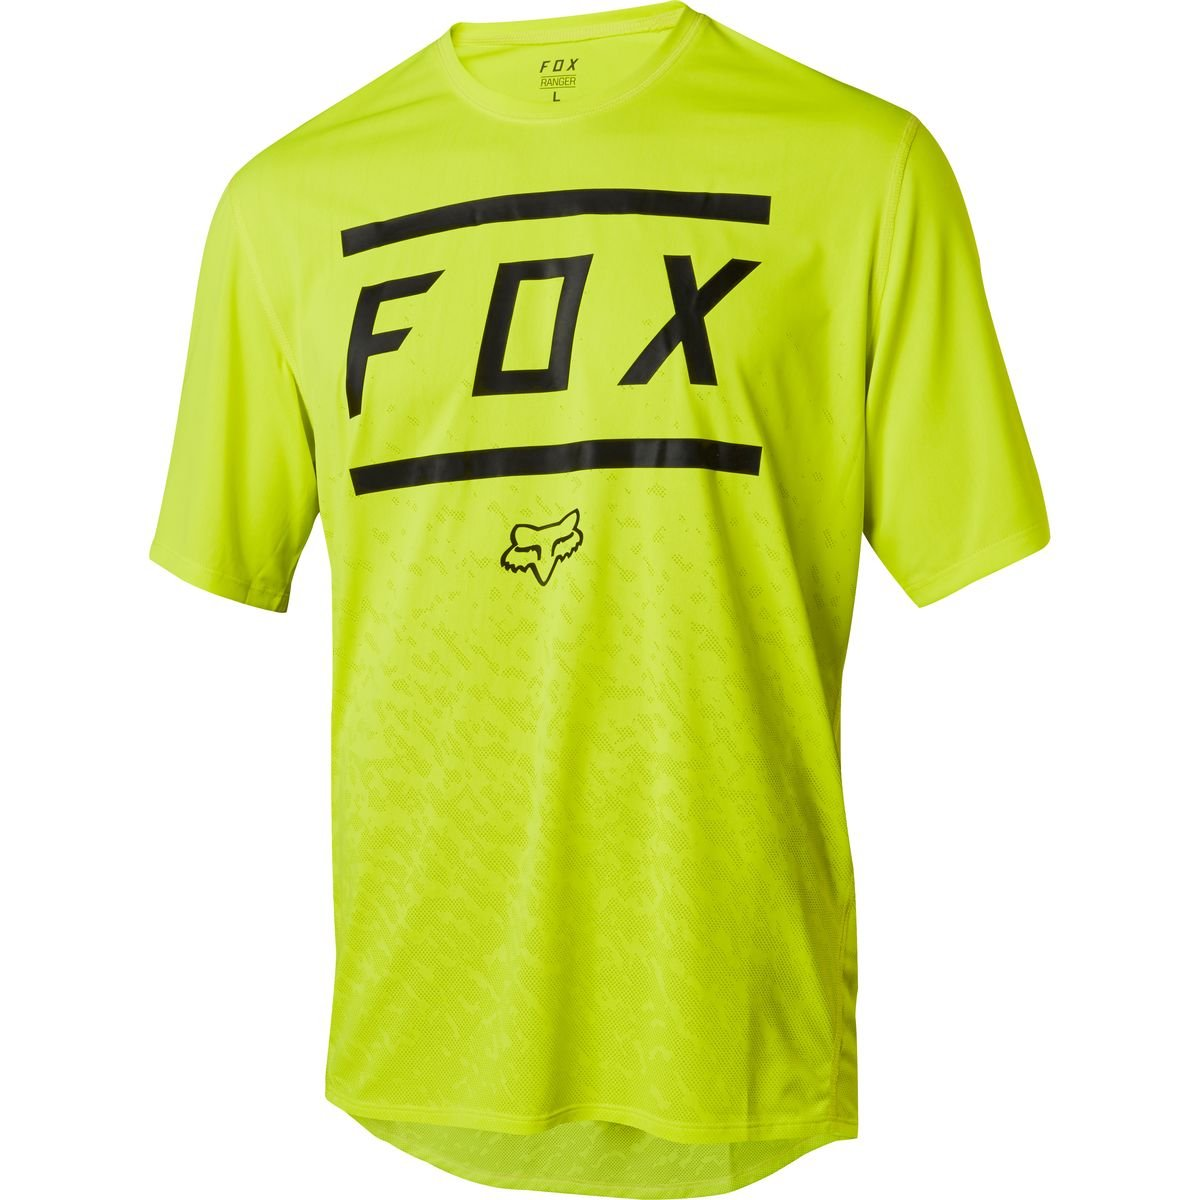 Fox Racing Ranger Jersey - Men's Bars Yellow/Black, L